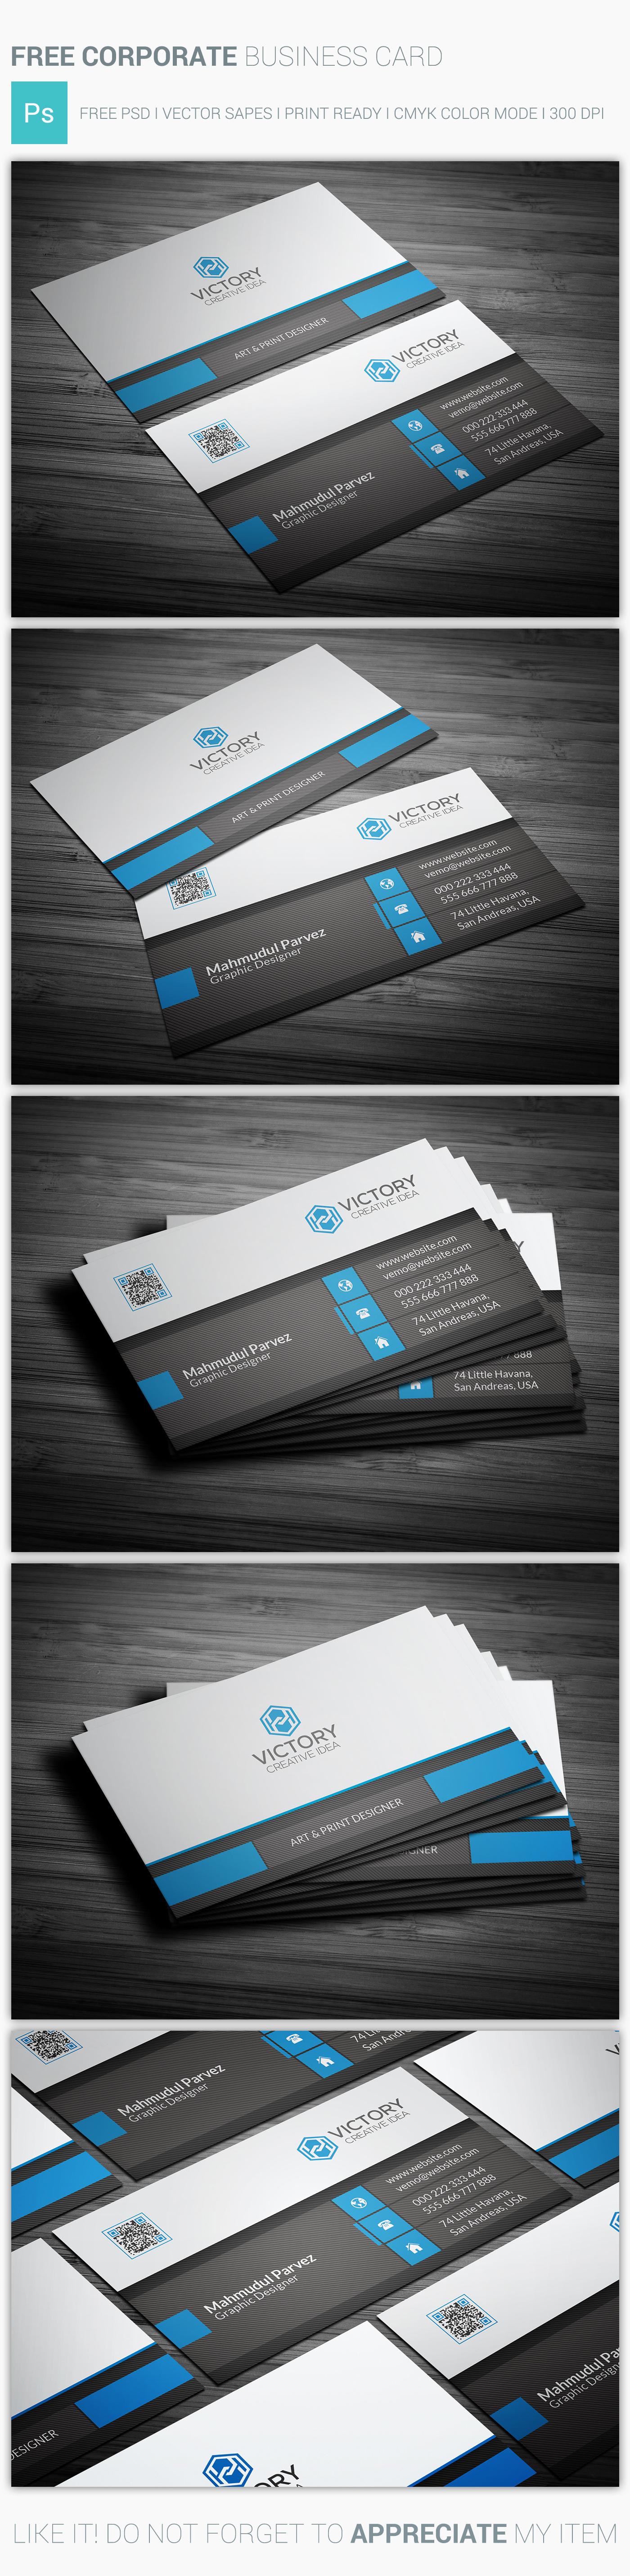 business business card card clean corporate creative design gray green horizontal minimal modern name personal psd